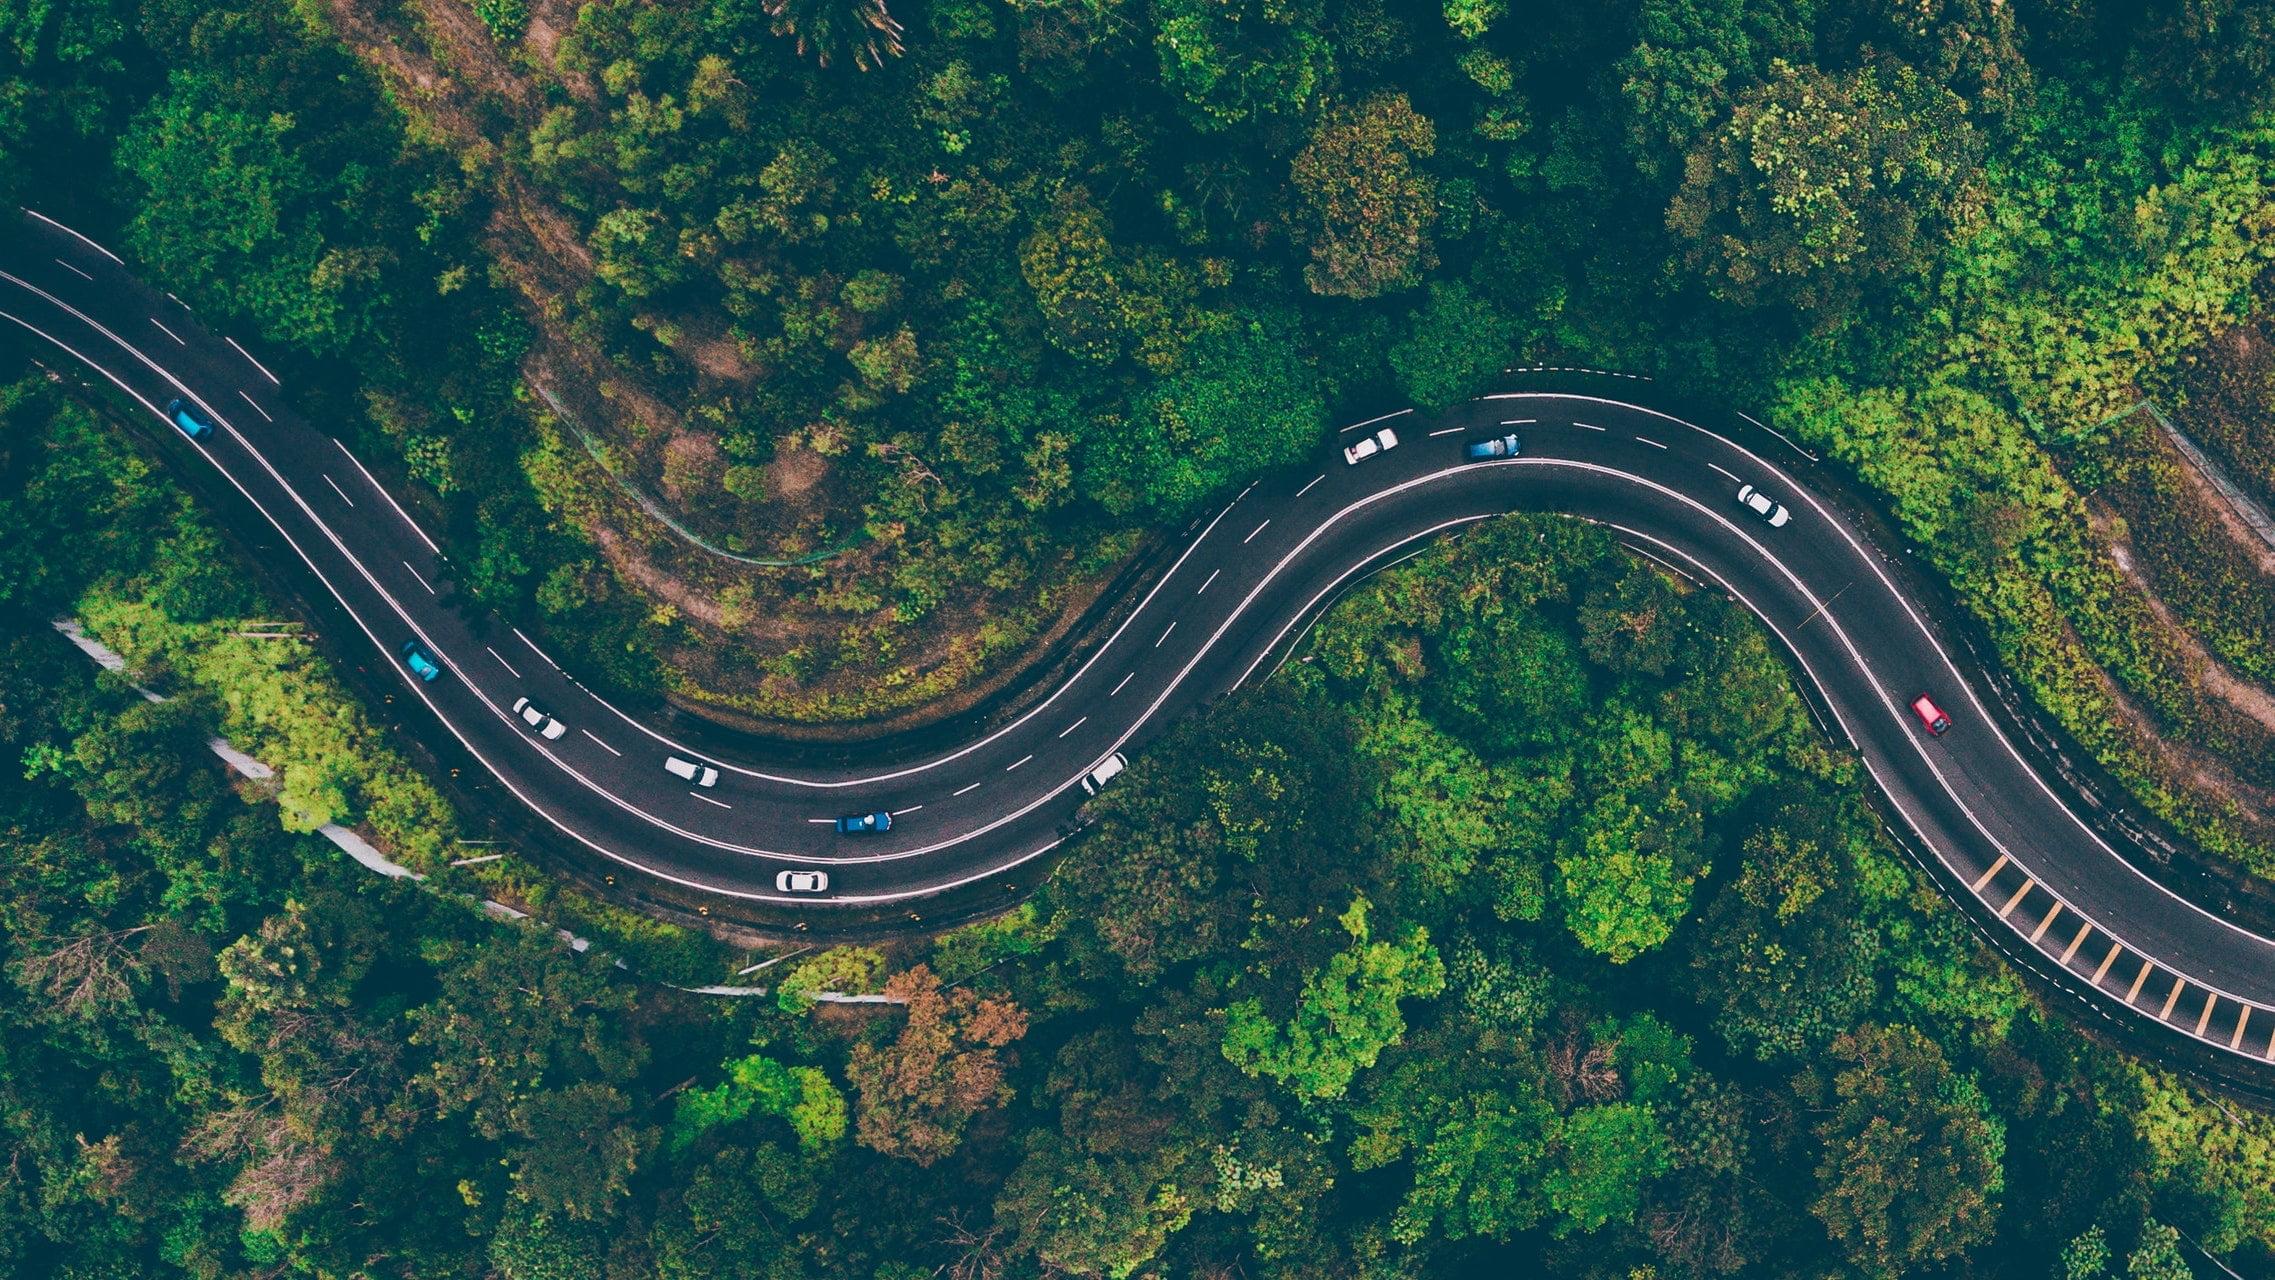 aerial aerial photography aerial shot 1173777 開往終點的路上|莫尼卡詩選